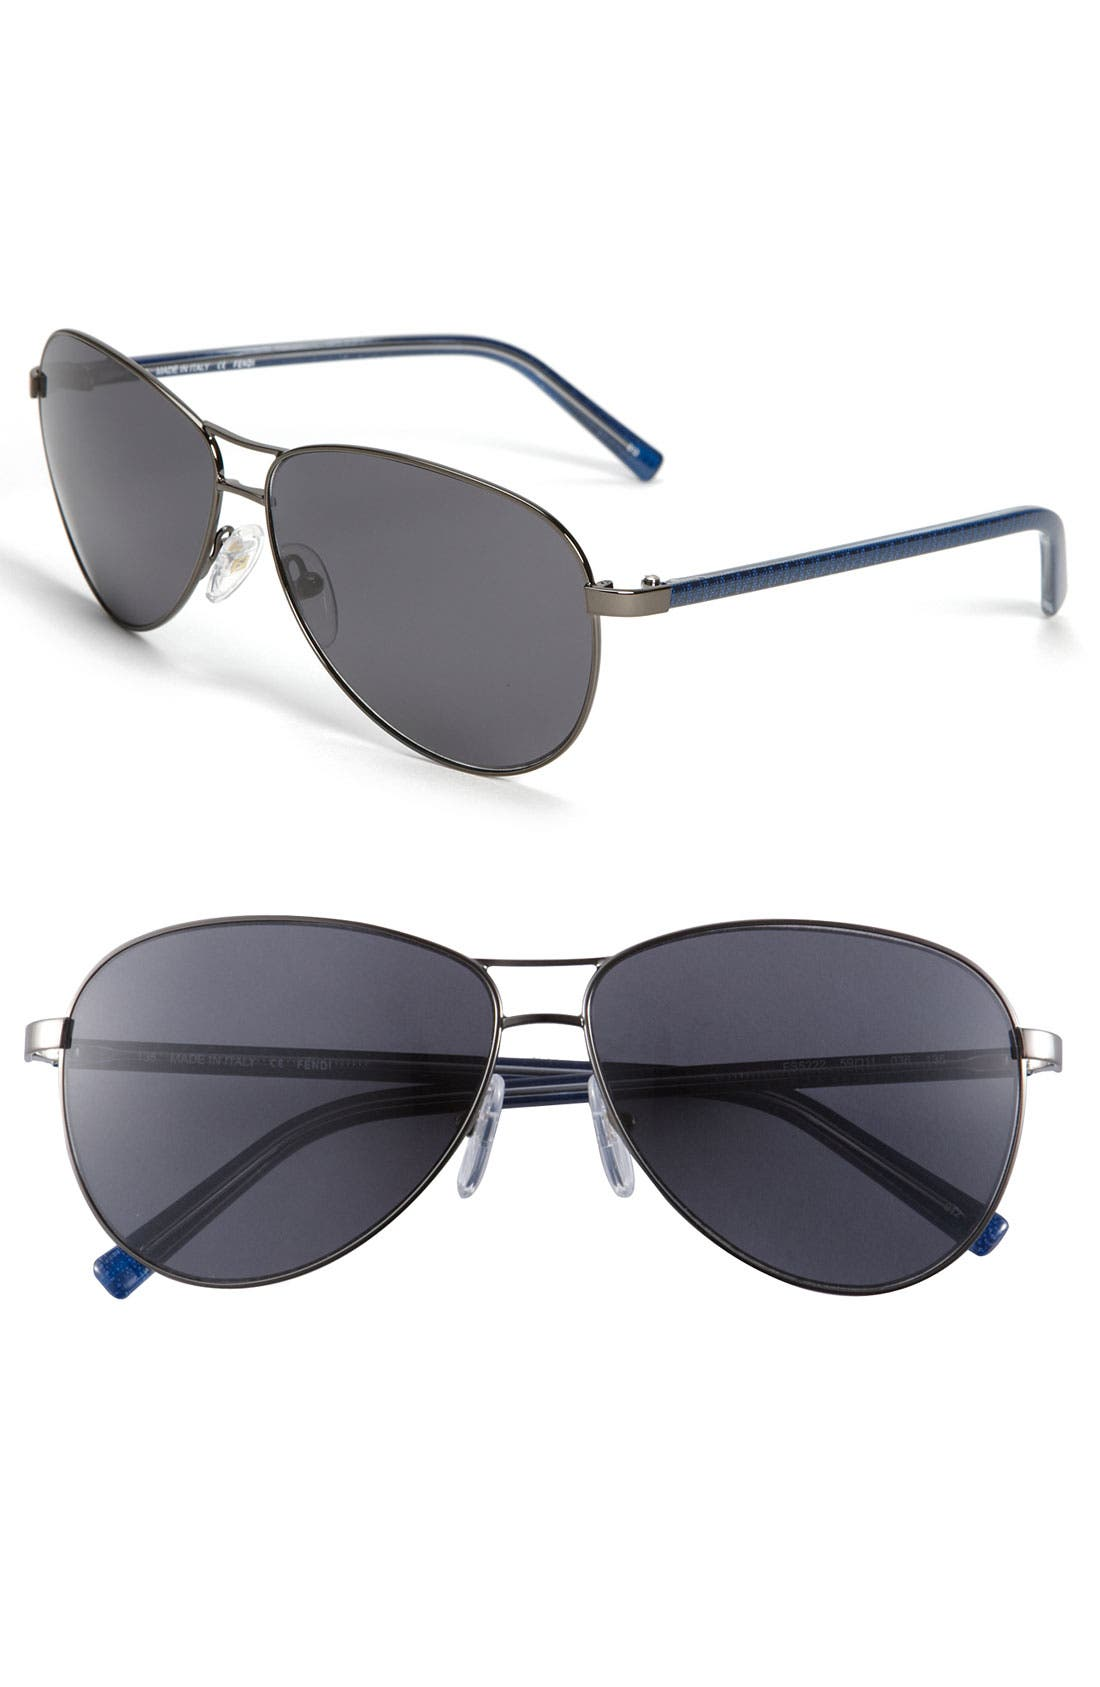 Alternate Image 1 Selected - Fendi Polarized Aviator Sunglasses